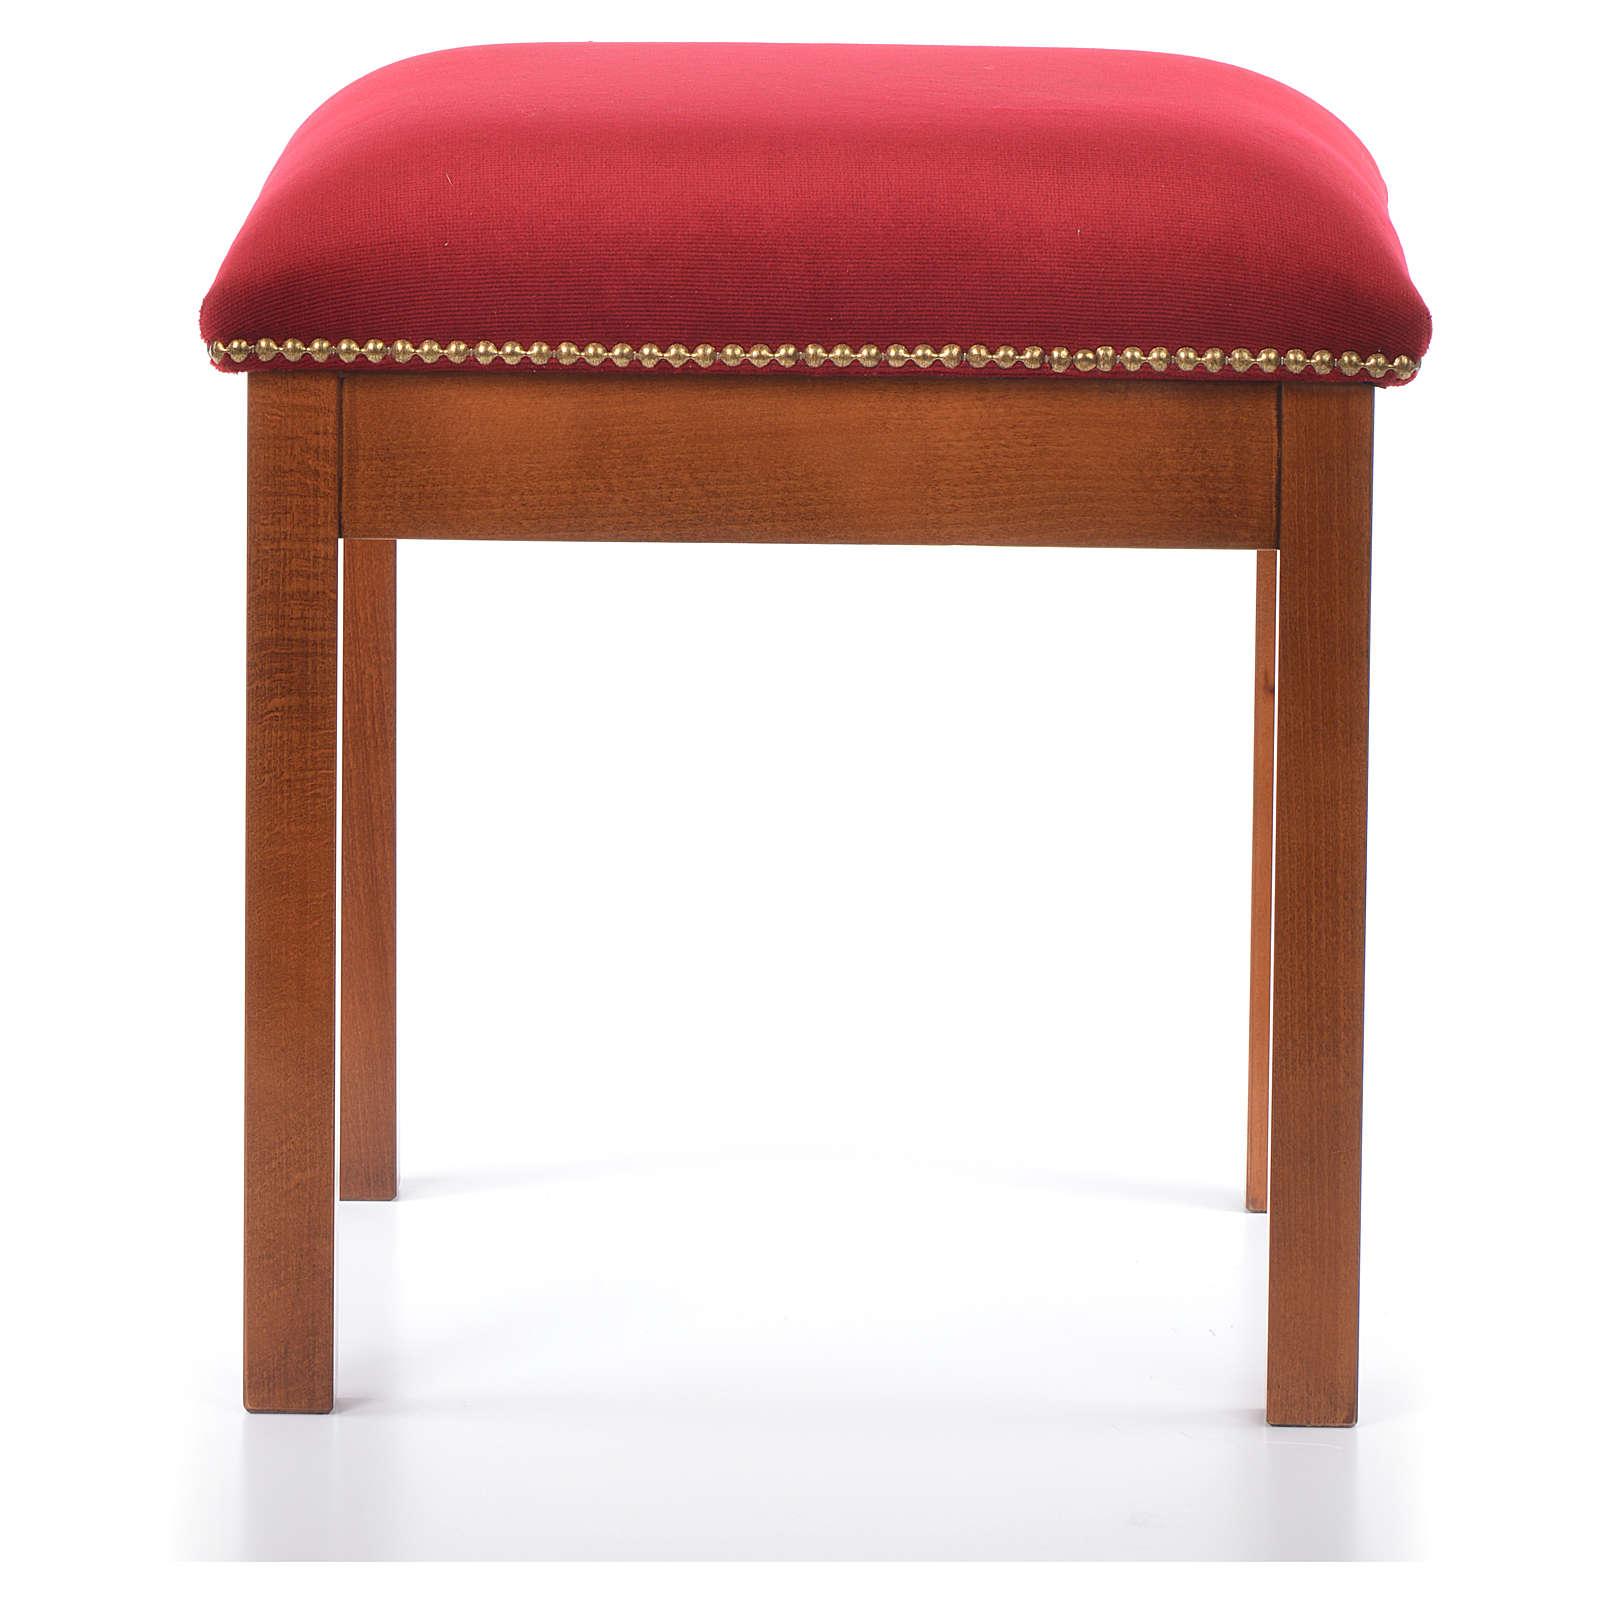 Silla moderna de madera de nuez modelo Assisi 4